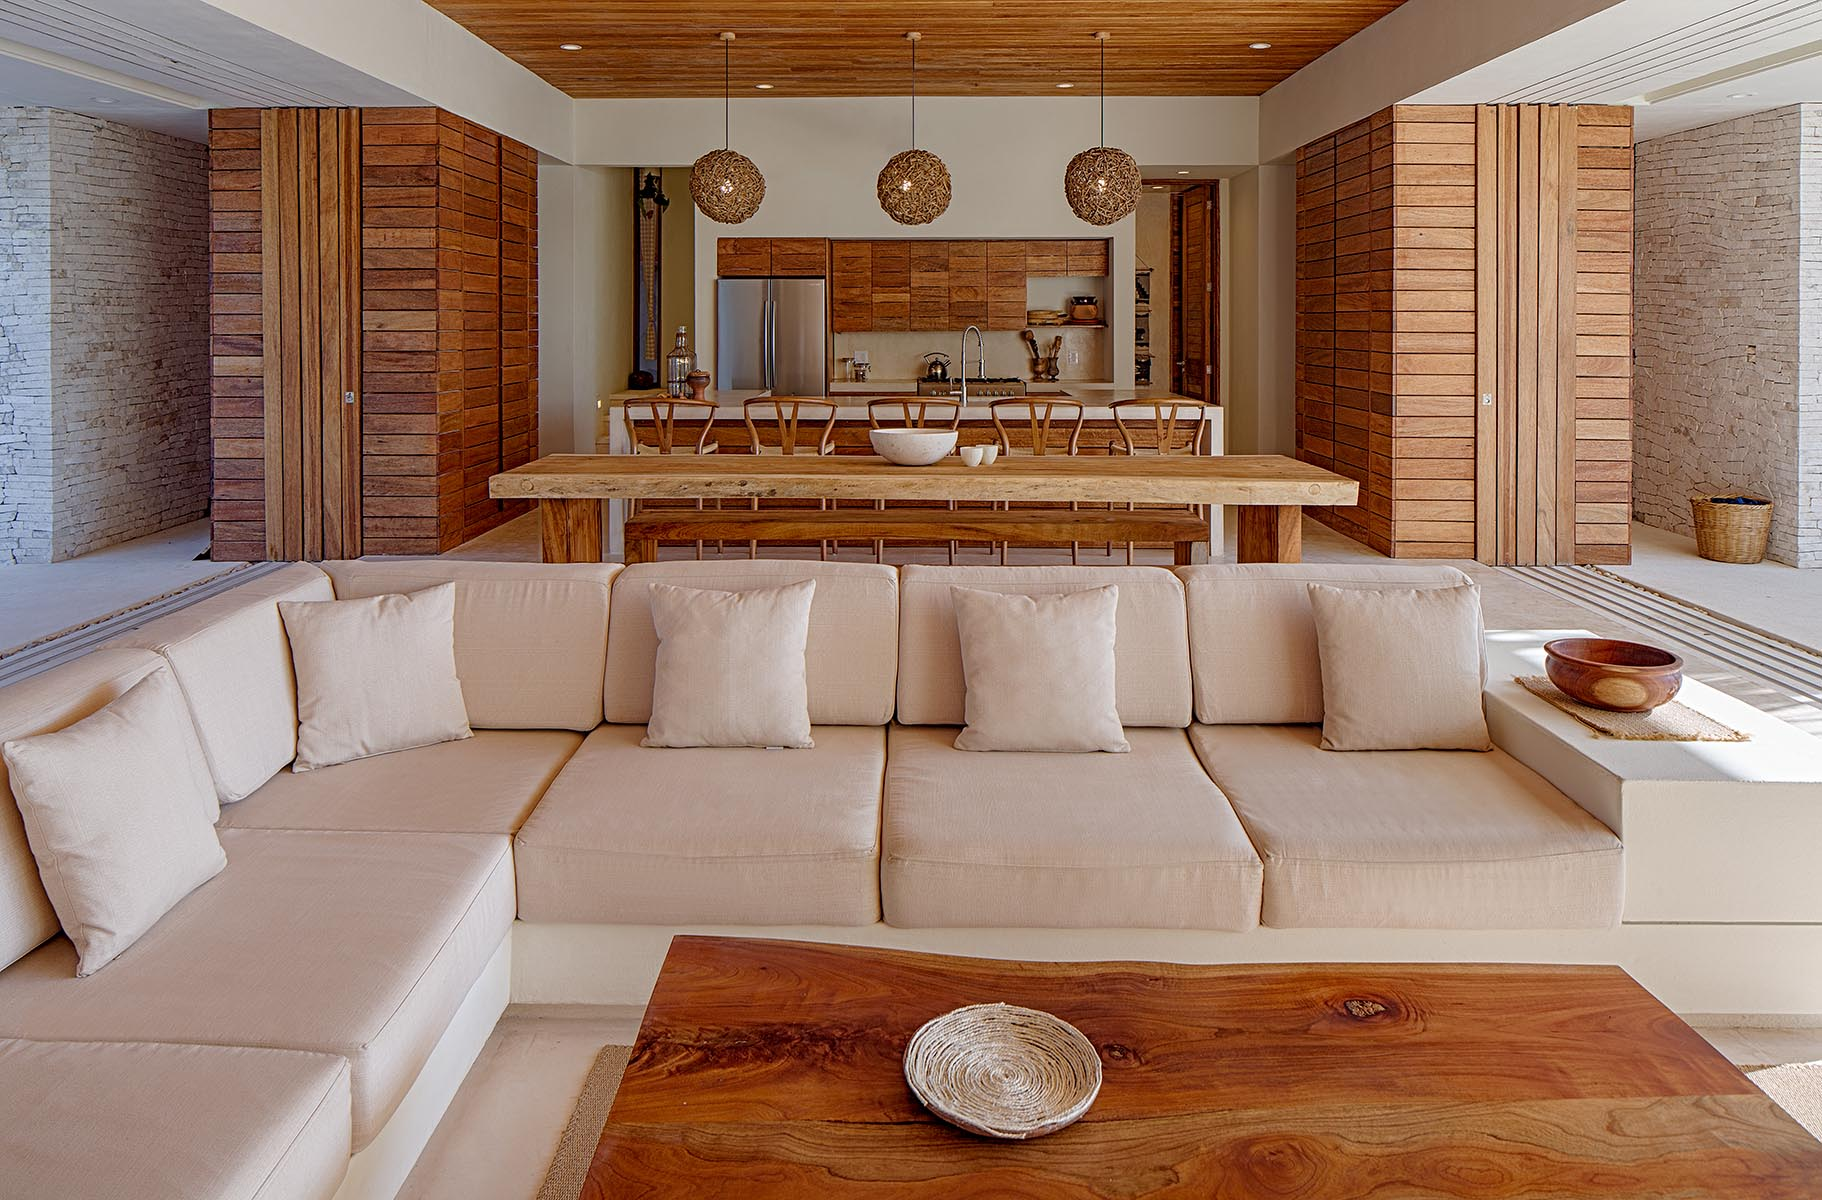 Casa xixim beachfront ecoluxe fully staffed private - Decoracion casas de playa ...